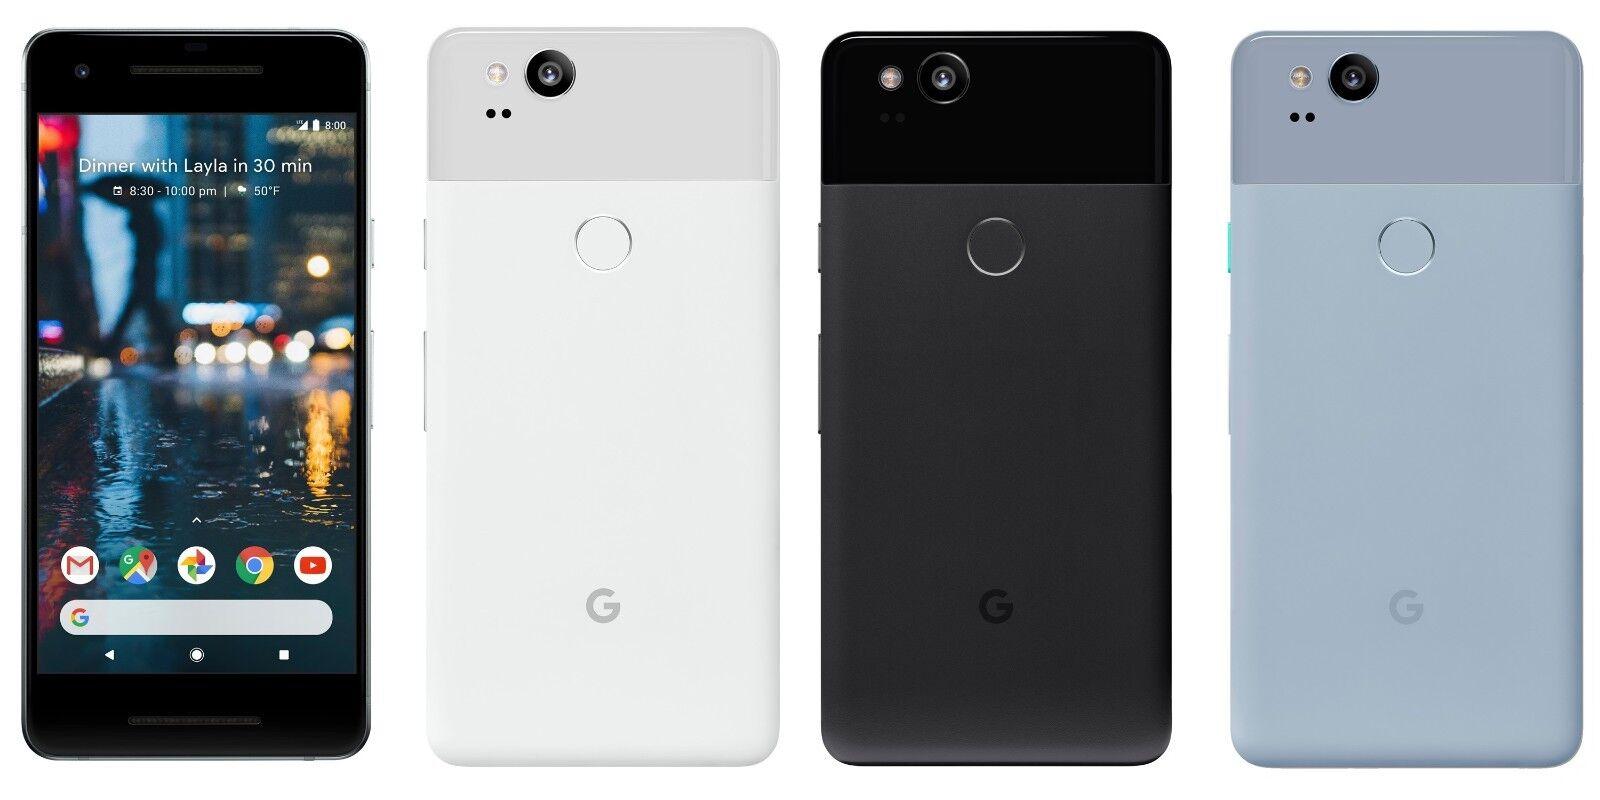 BRAND NEW Google Pixel 2 AND Google Pixel XL 2 FACTORY UNLOCKED 64/128 GB, 4 GB